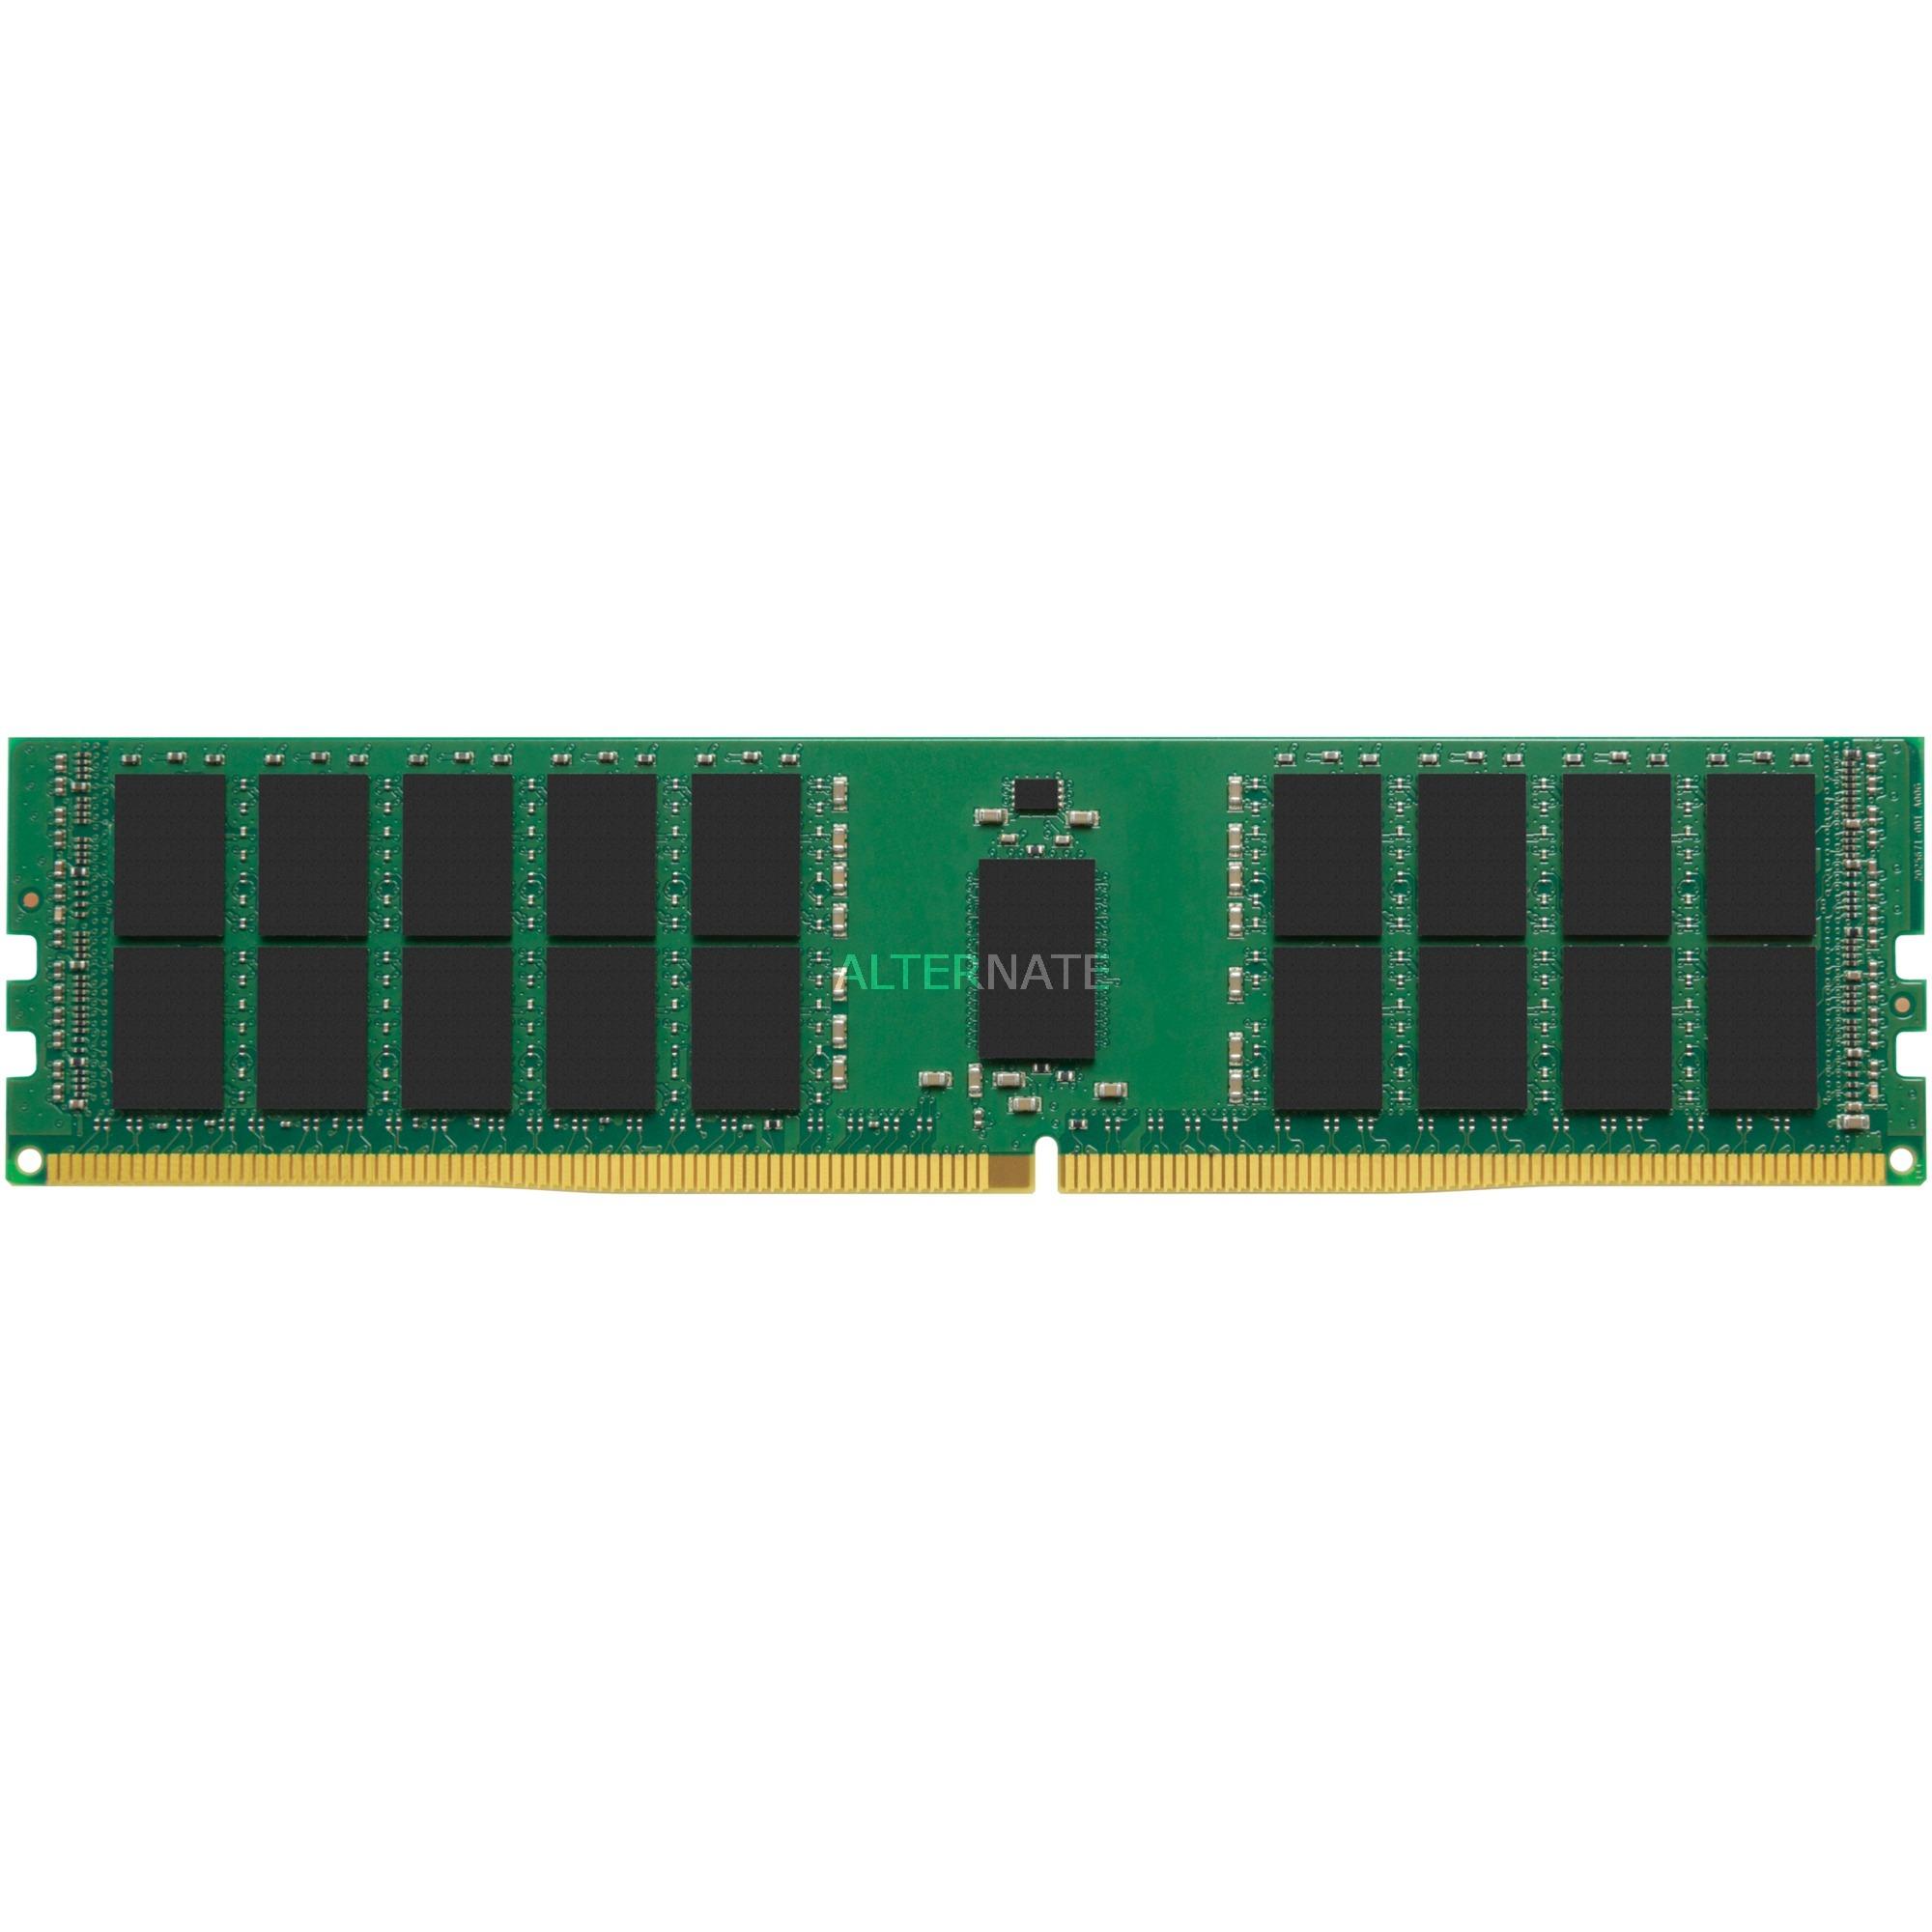 KSM24ED8/16ME módulo de memoria 16 GB DDR4 2400 MHz ECC, Memoria RAM